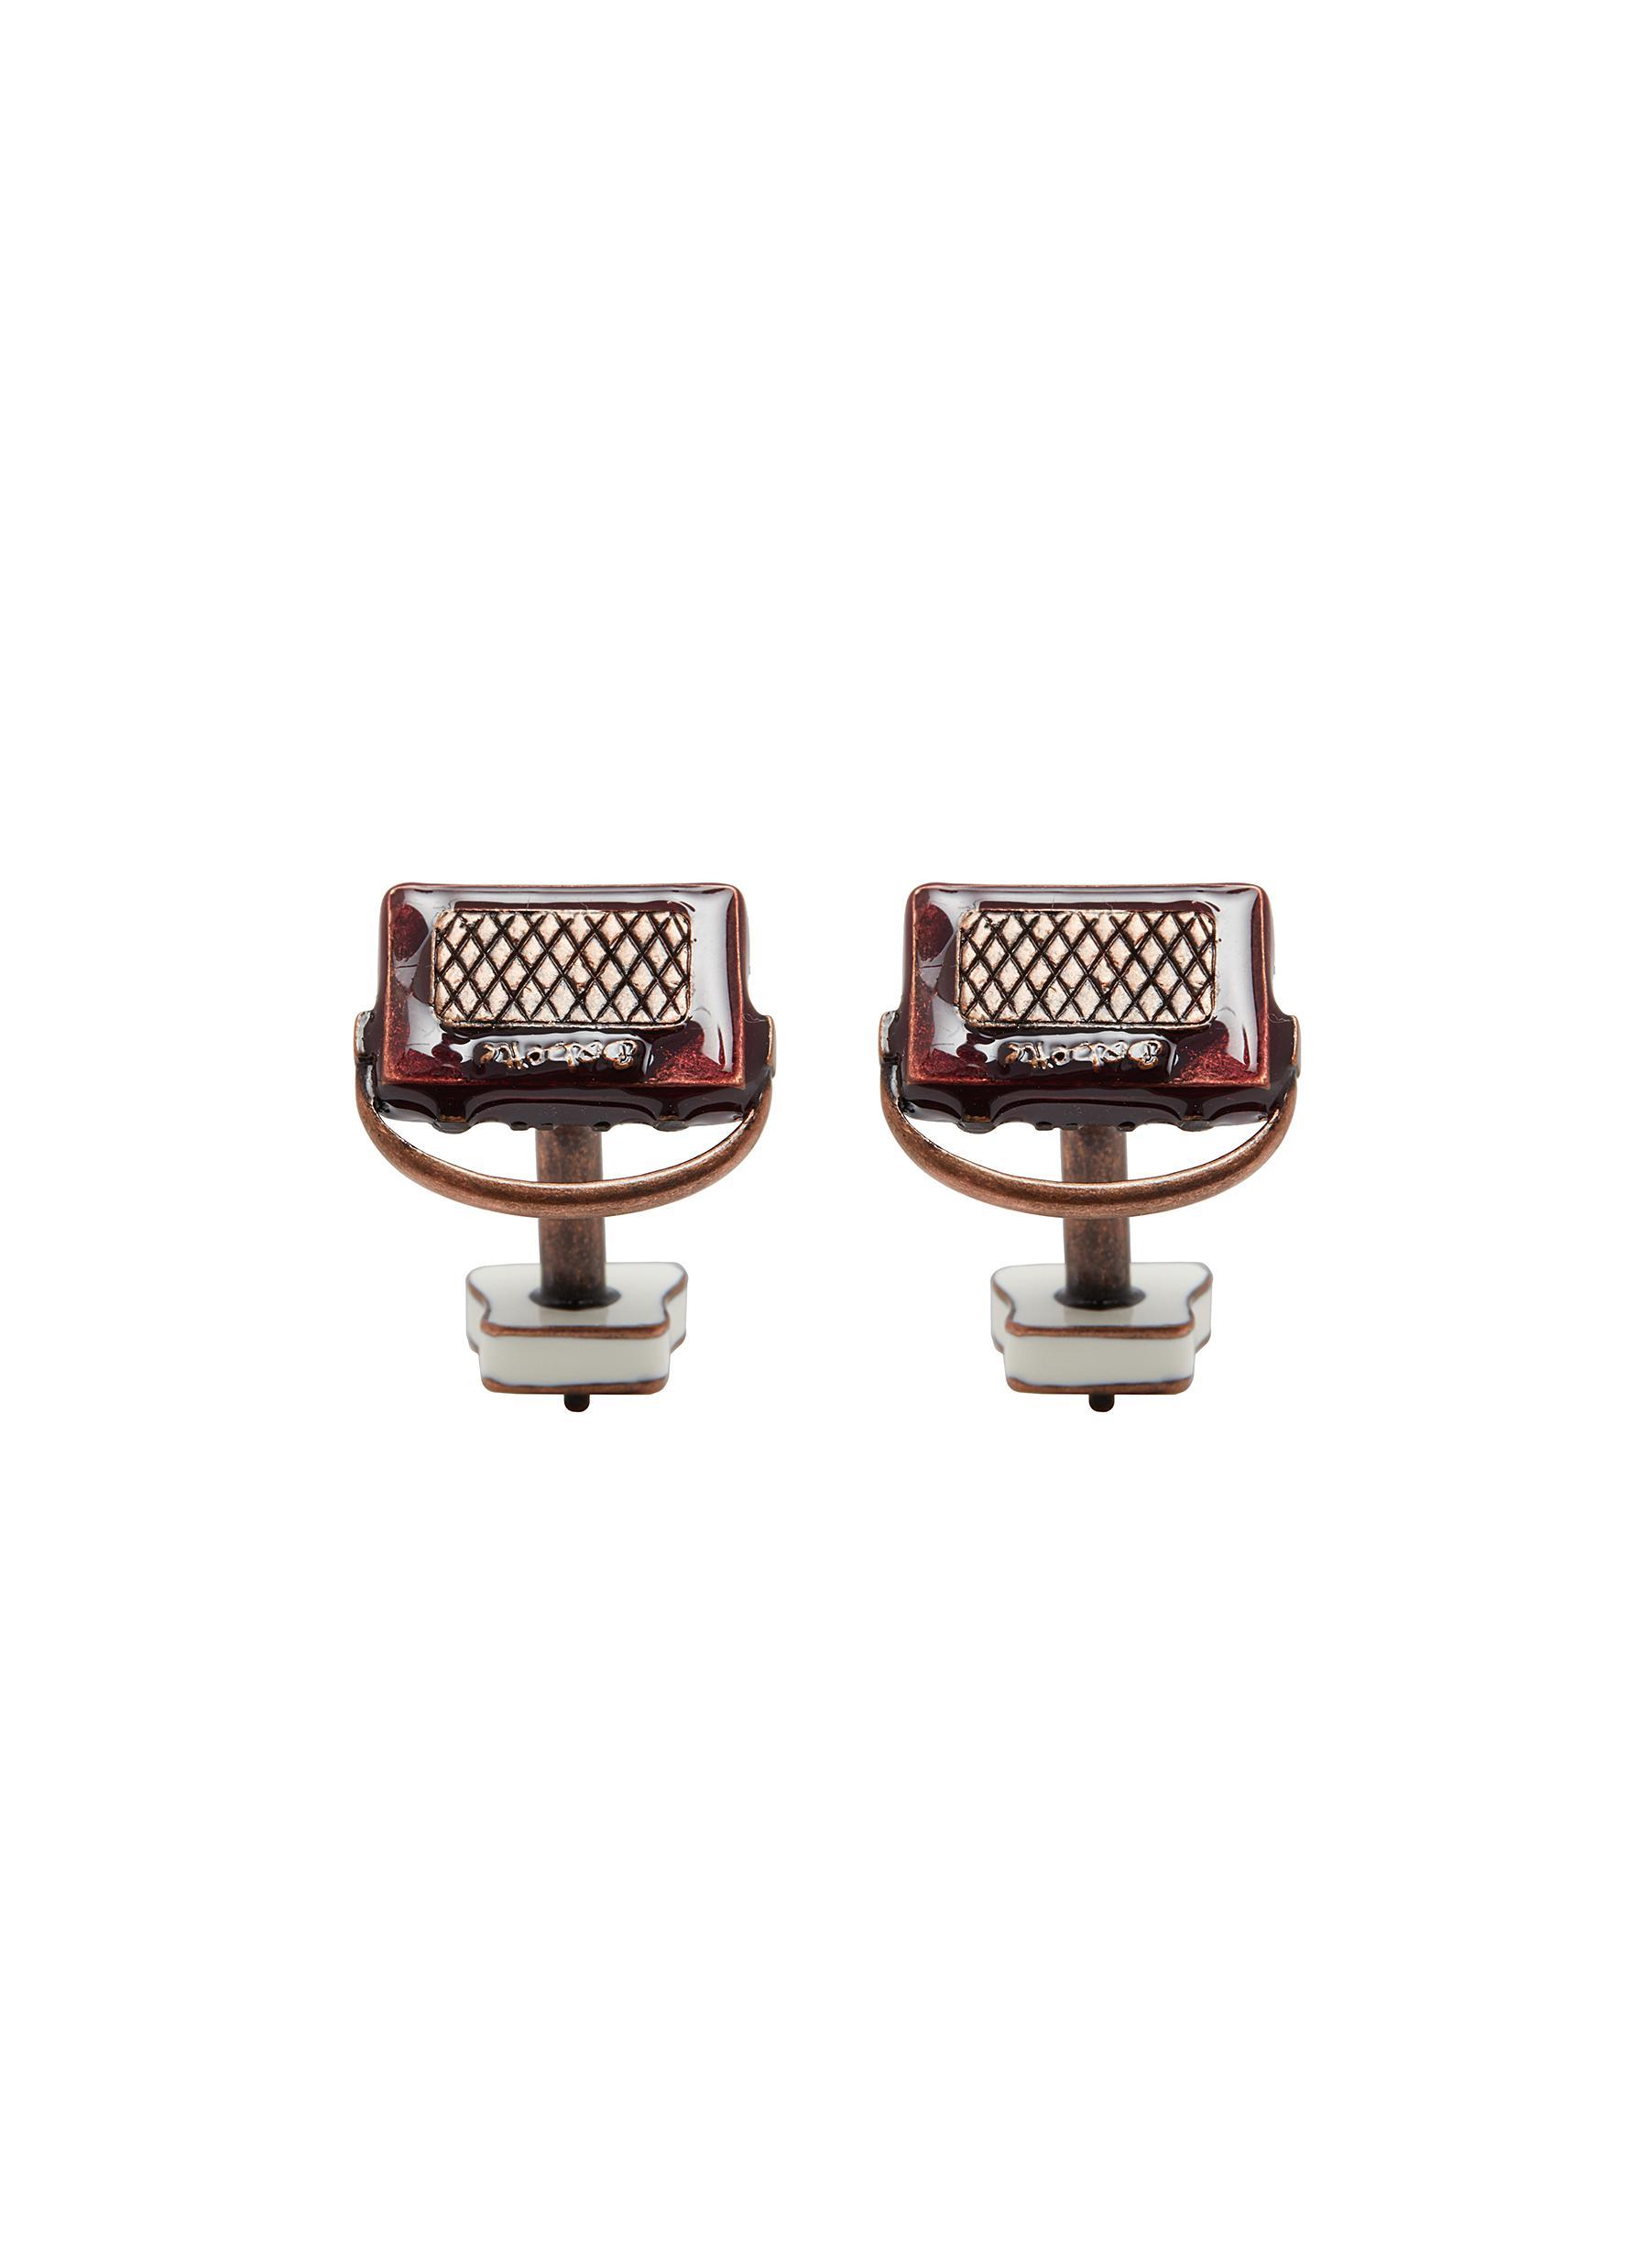 Retro radio and plug cufflinks